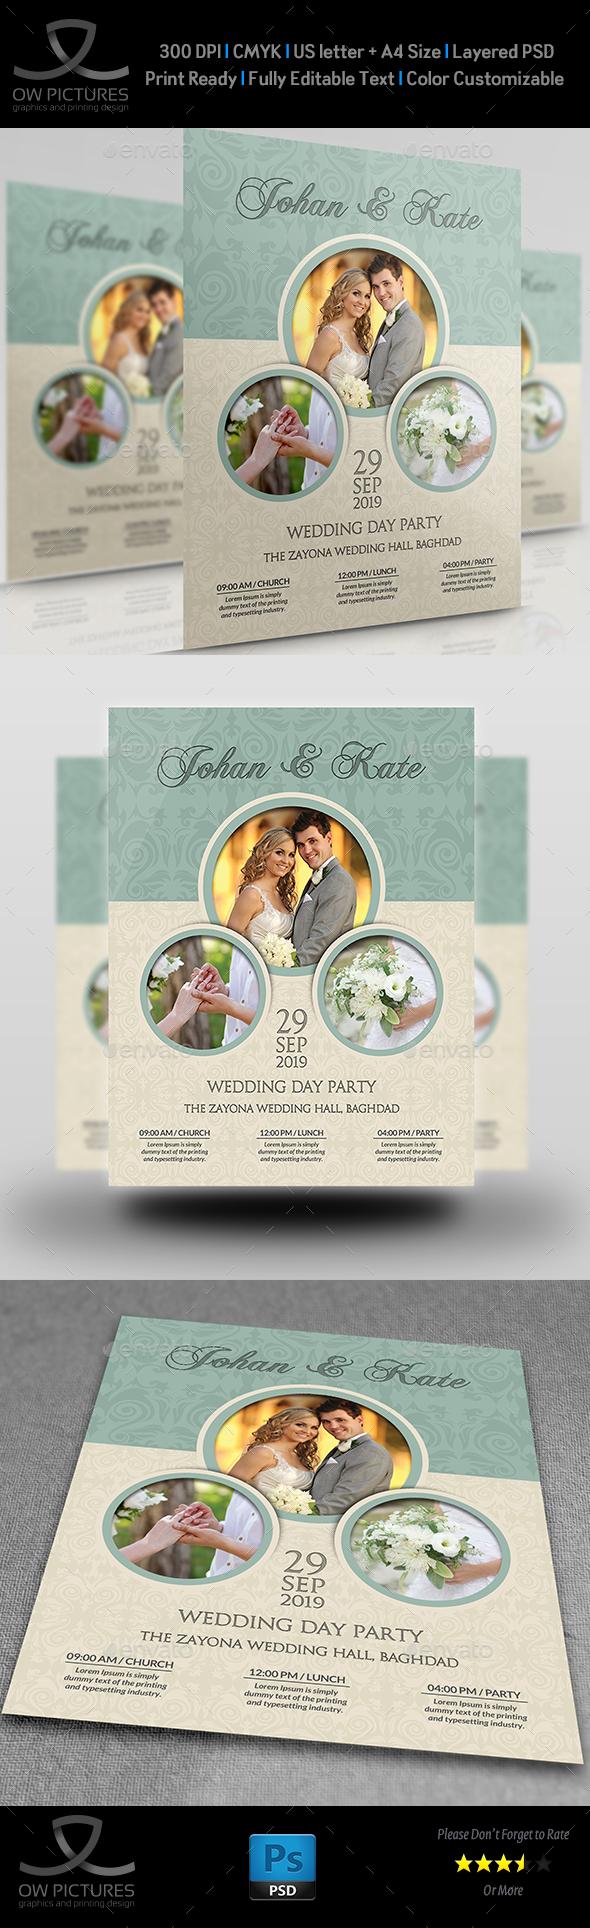 Wedding Party Flyer Template Vol.6 - Flyers Print Templates